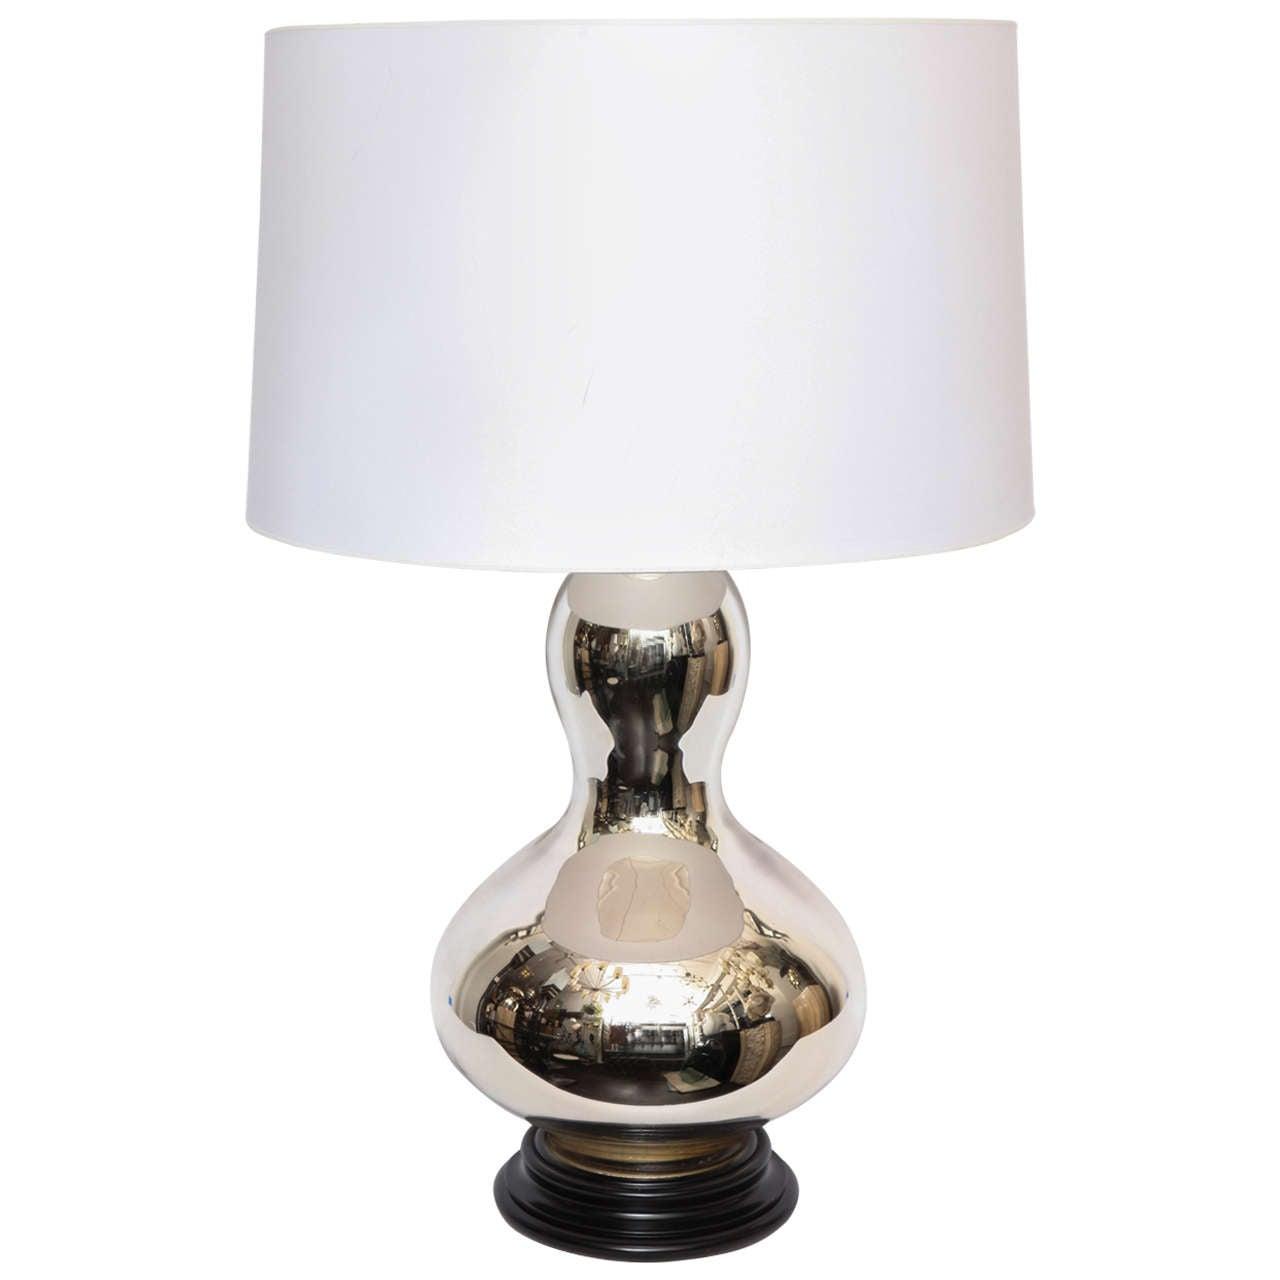 1960s Sculptural Mercury Glass Table Lamp